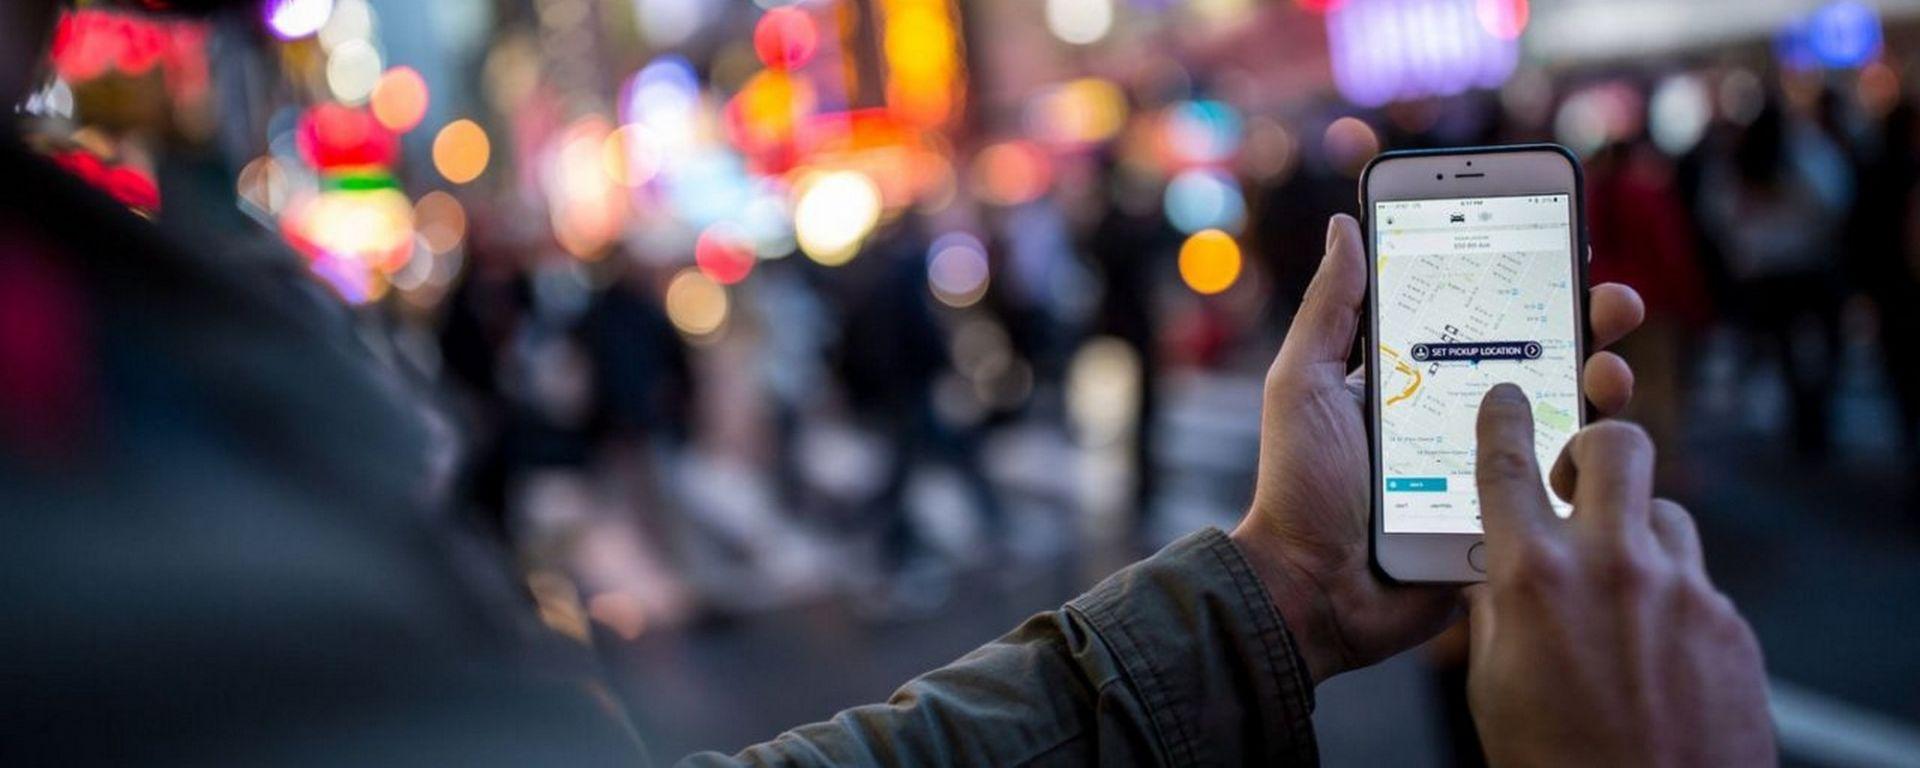 Uber, a New York sorpasso storico